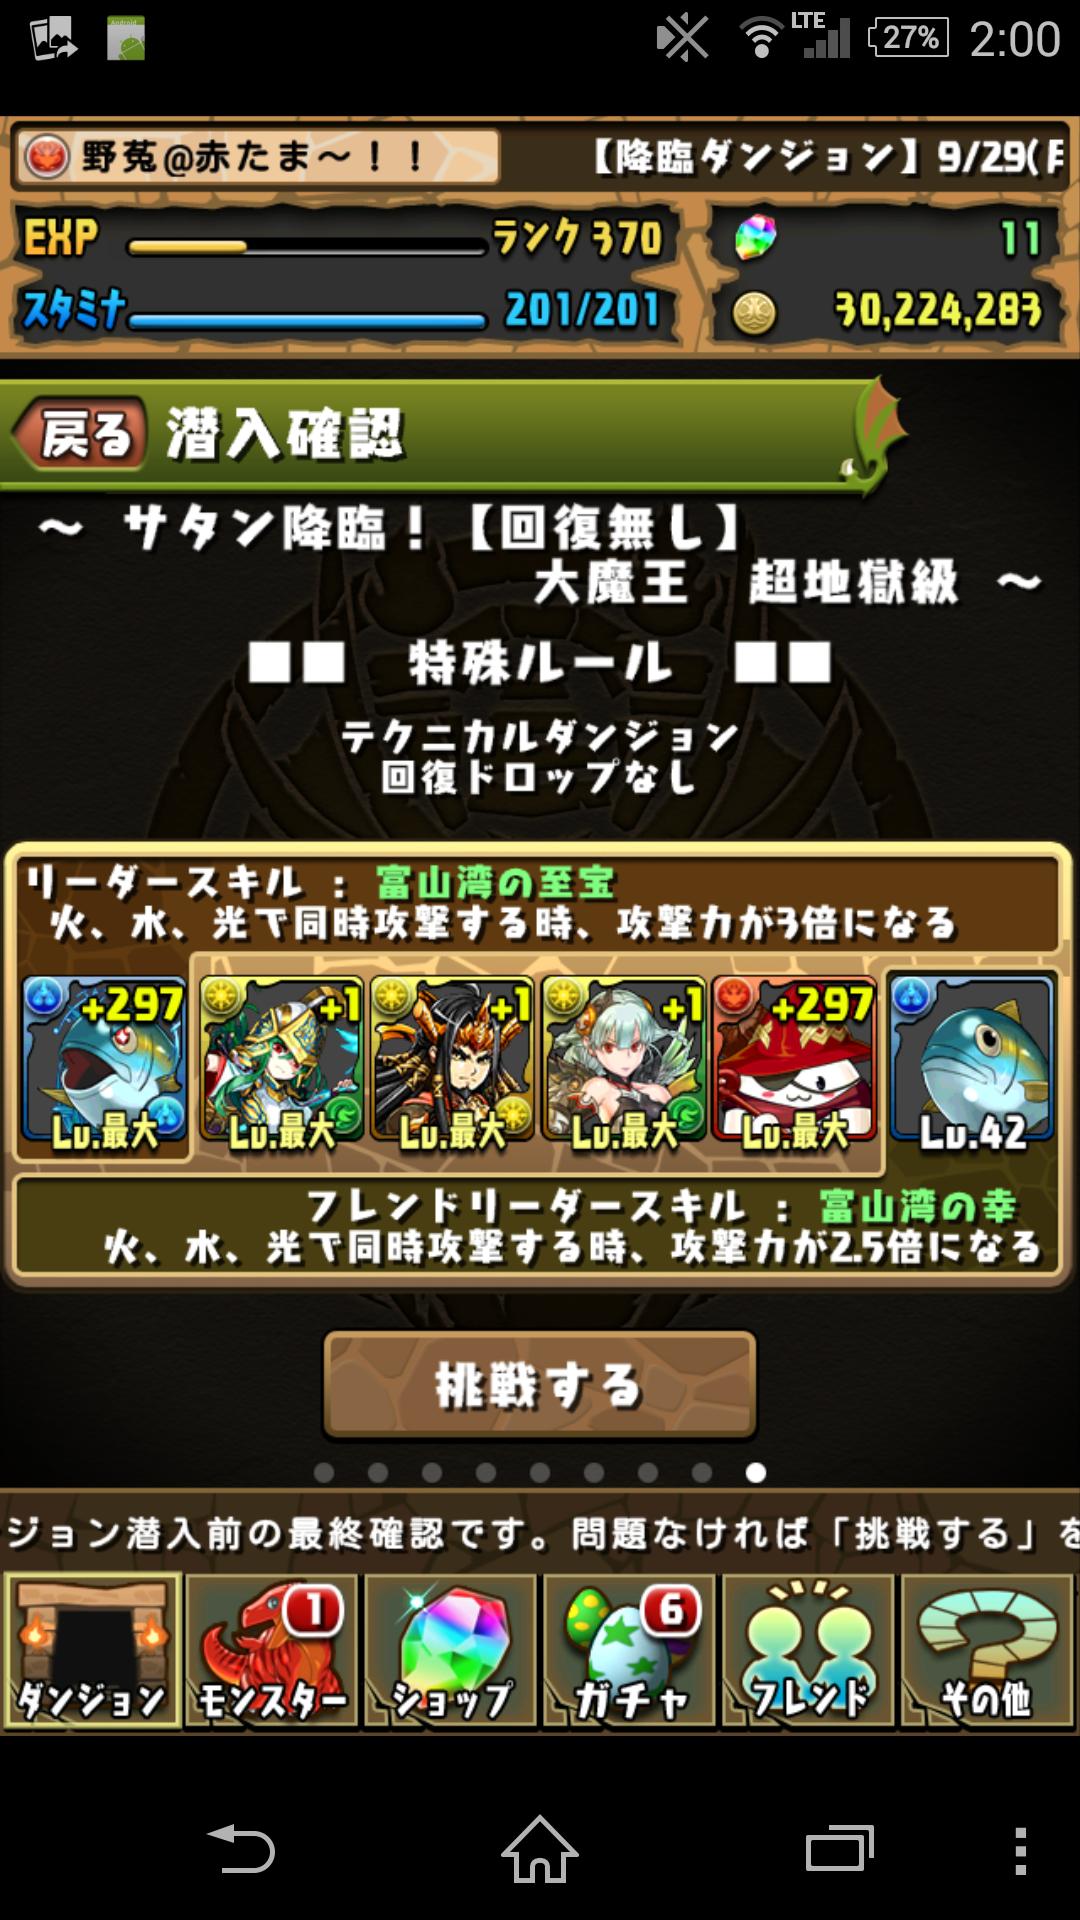 Screenshot_2014-09-30-02-00-47.png